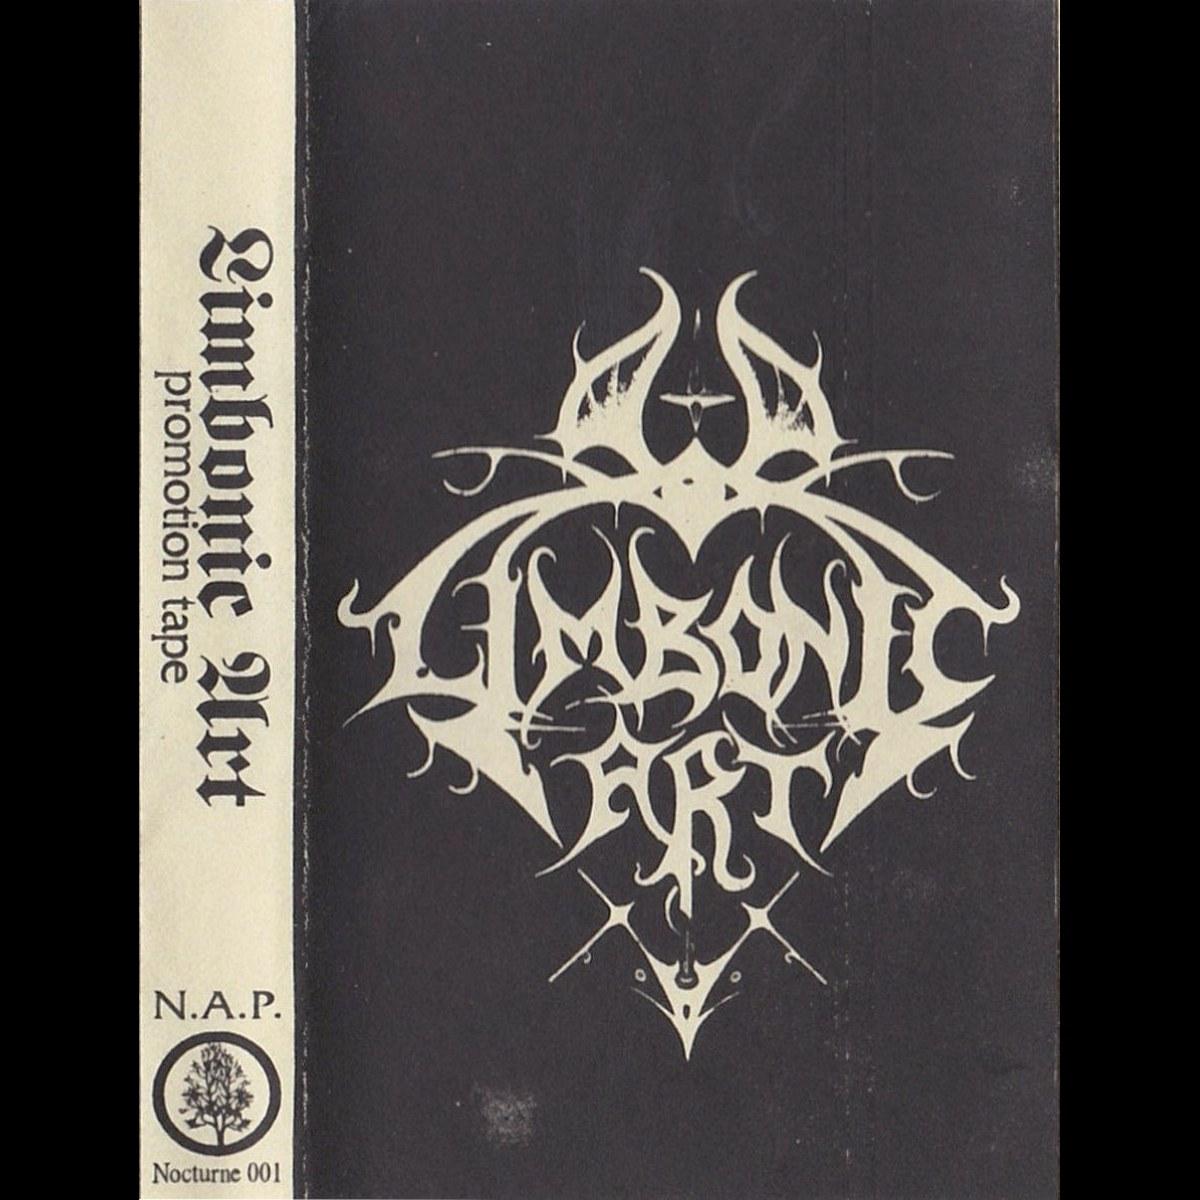 Review for Limbonic Art - Promo 1996